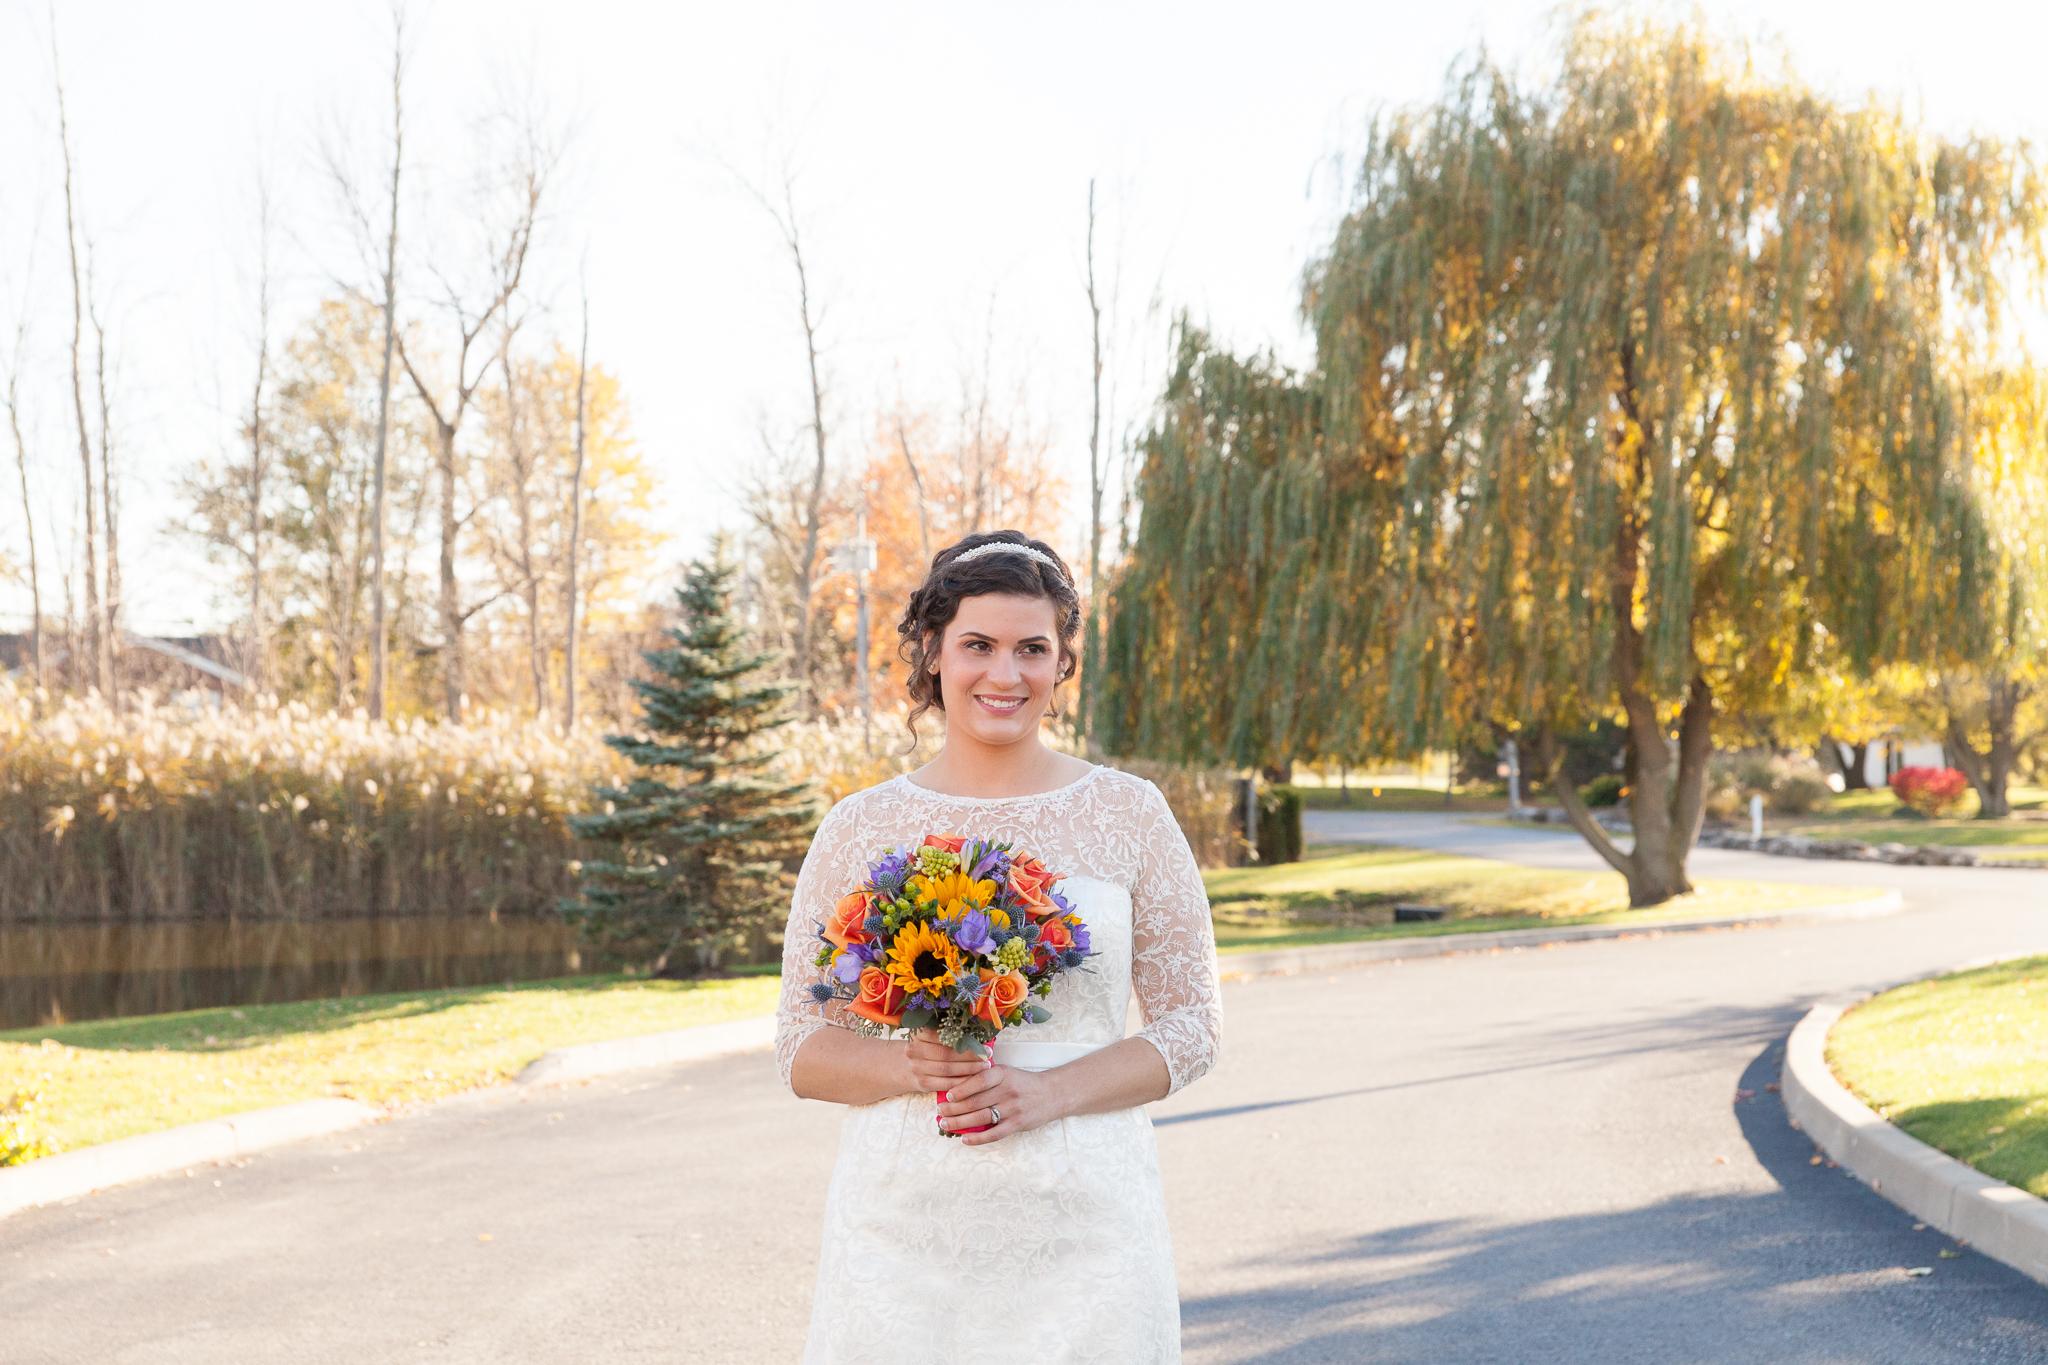 camuglia-whomstudio-chelsea_and_andy-nycphotographer-wedding-brooklyn-buffalo-timberlodge-019-0078.jpg